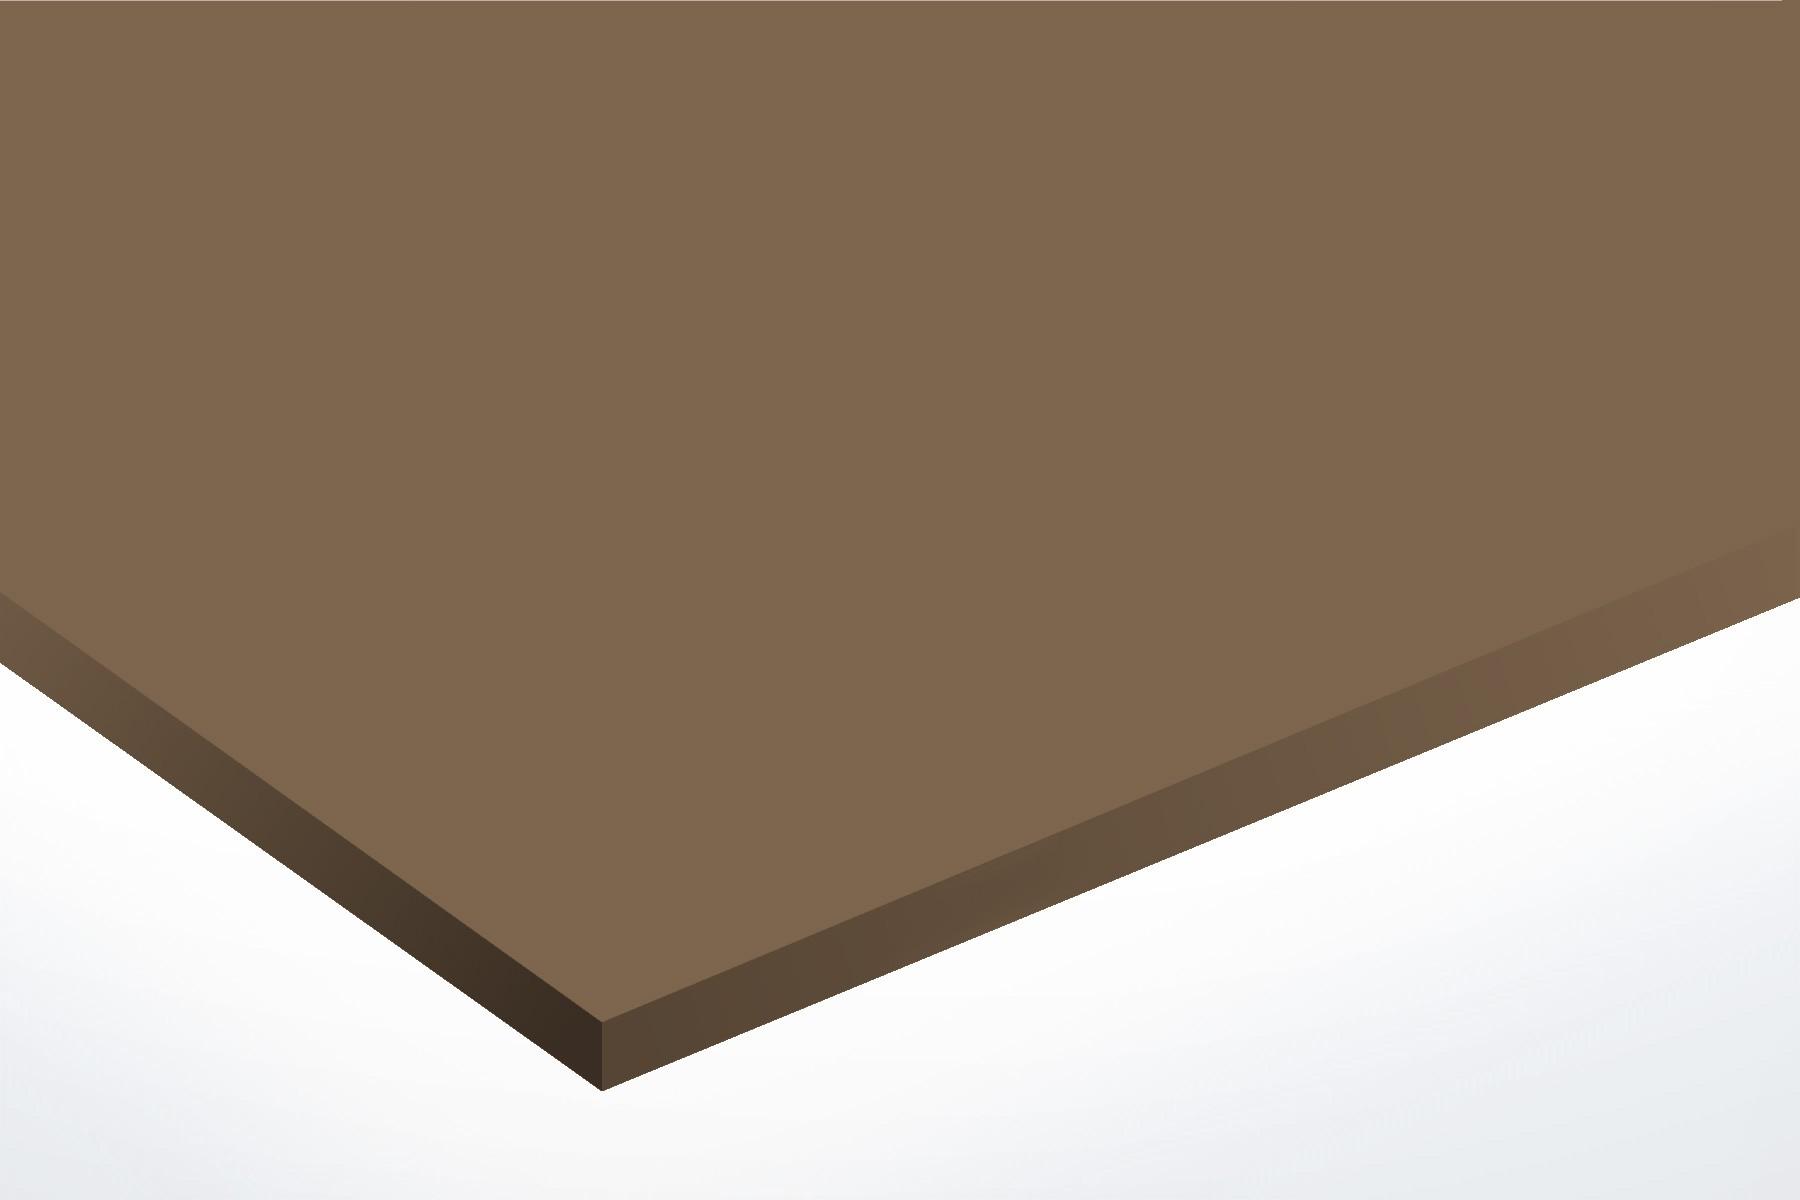 Anodised Aluminium Bronze, Matte, 1.5mm x 1000mm x 500mm